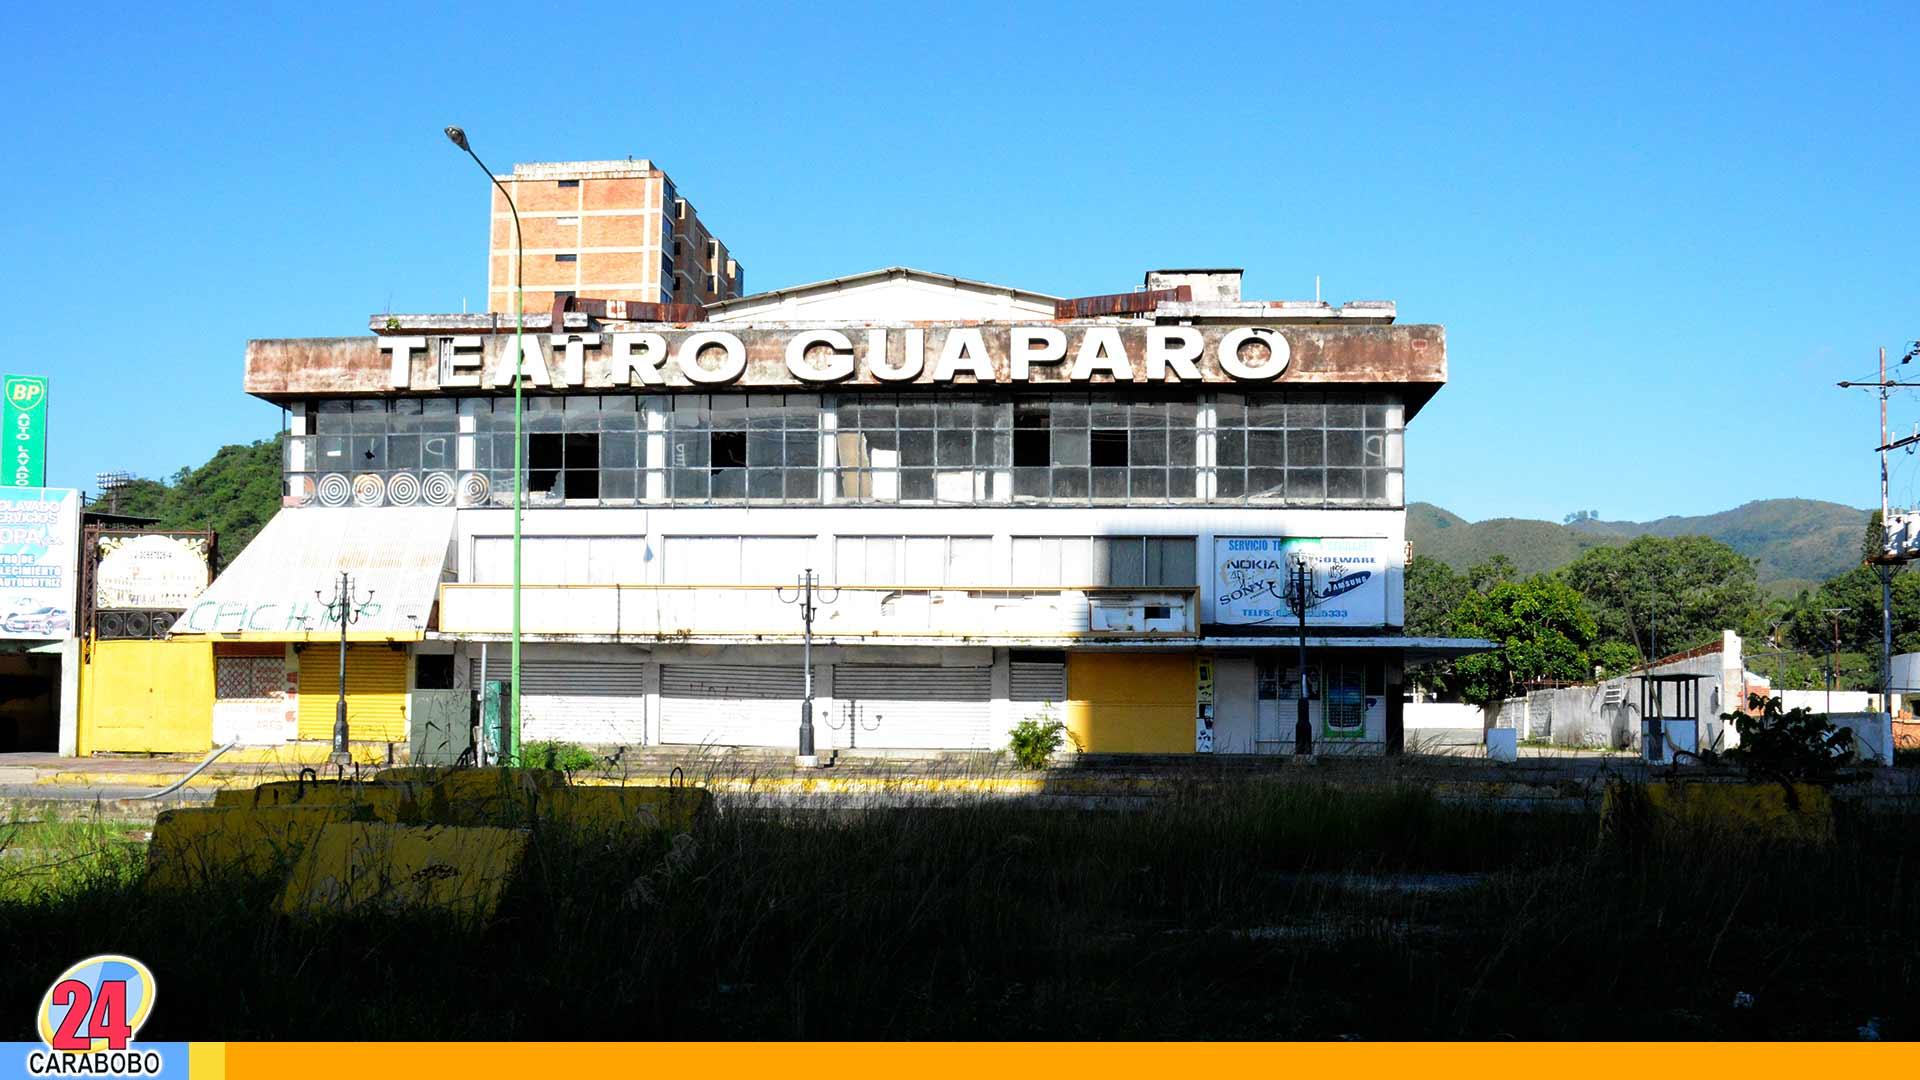 Teatro Guaparo - Noticias 24 Carabobo